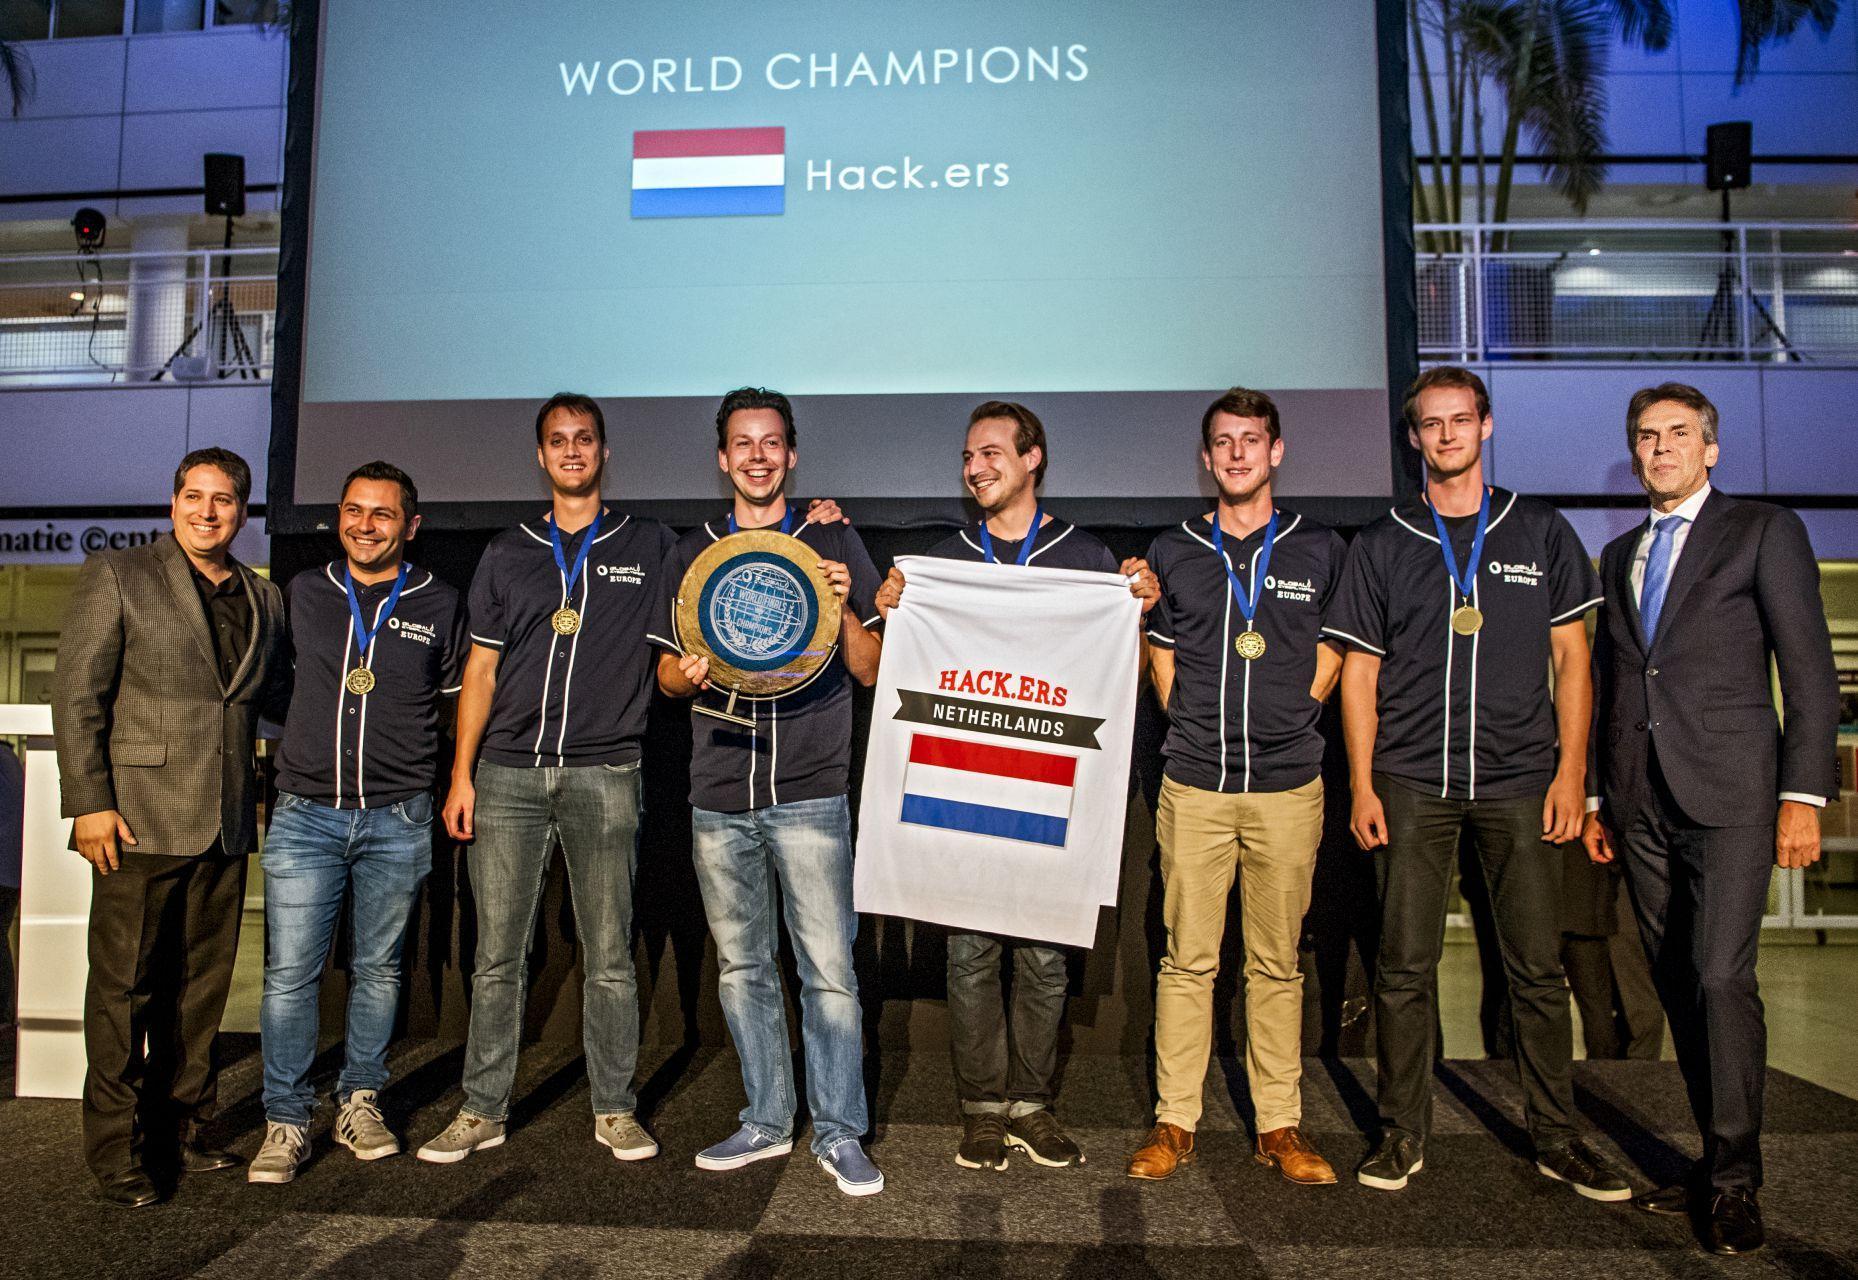 Netherlands Team Hack.ers World Champion Hacking